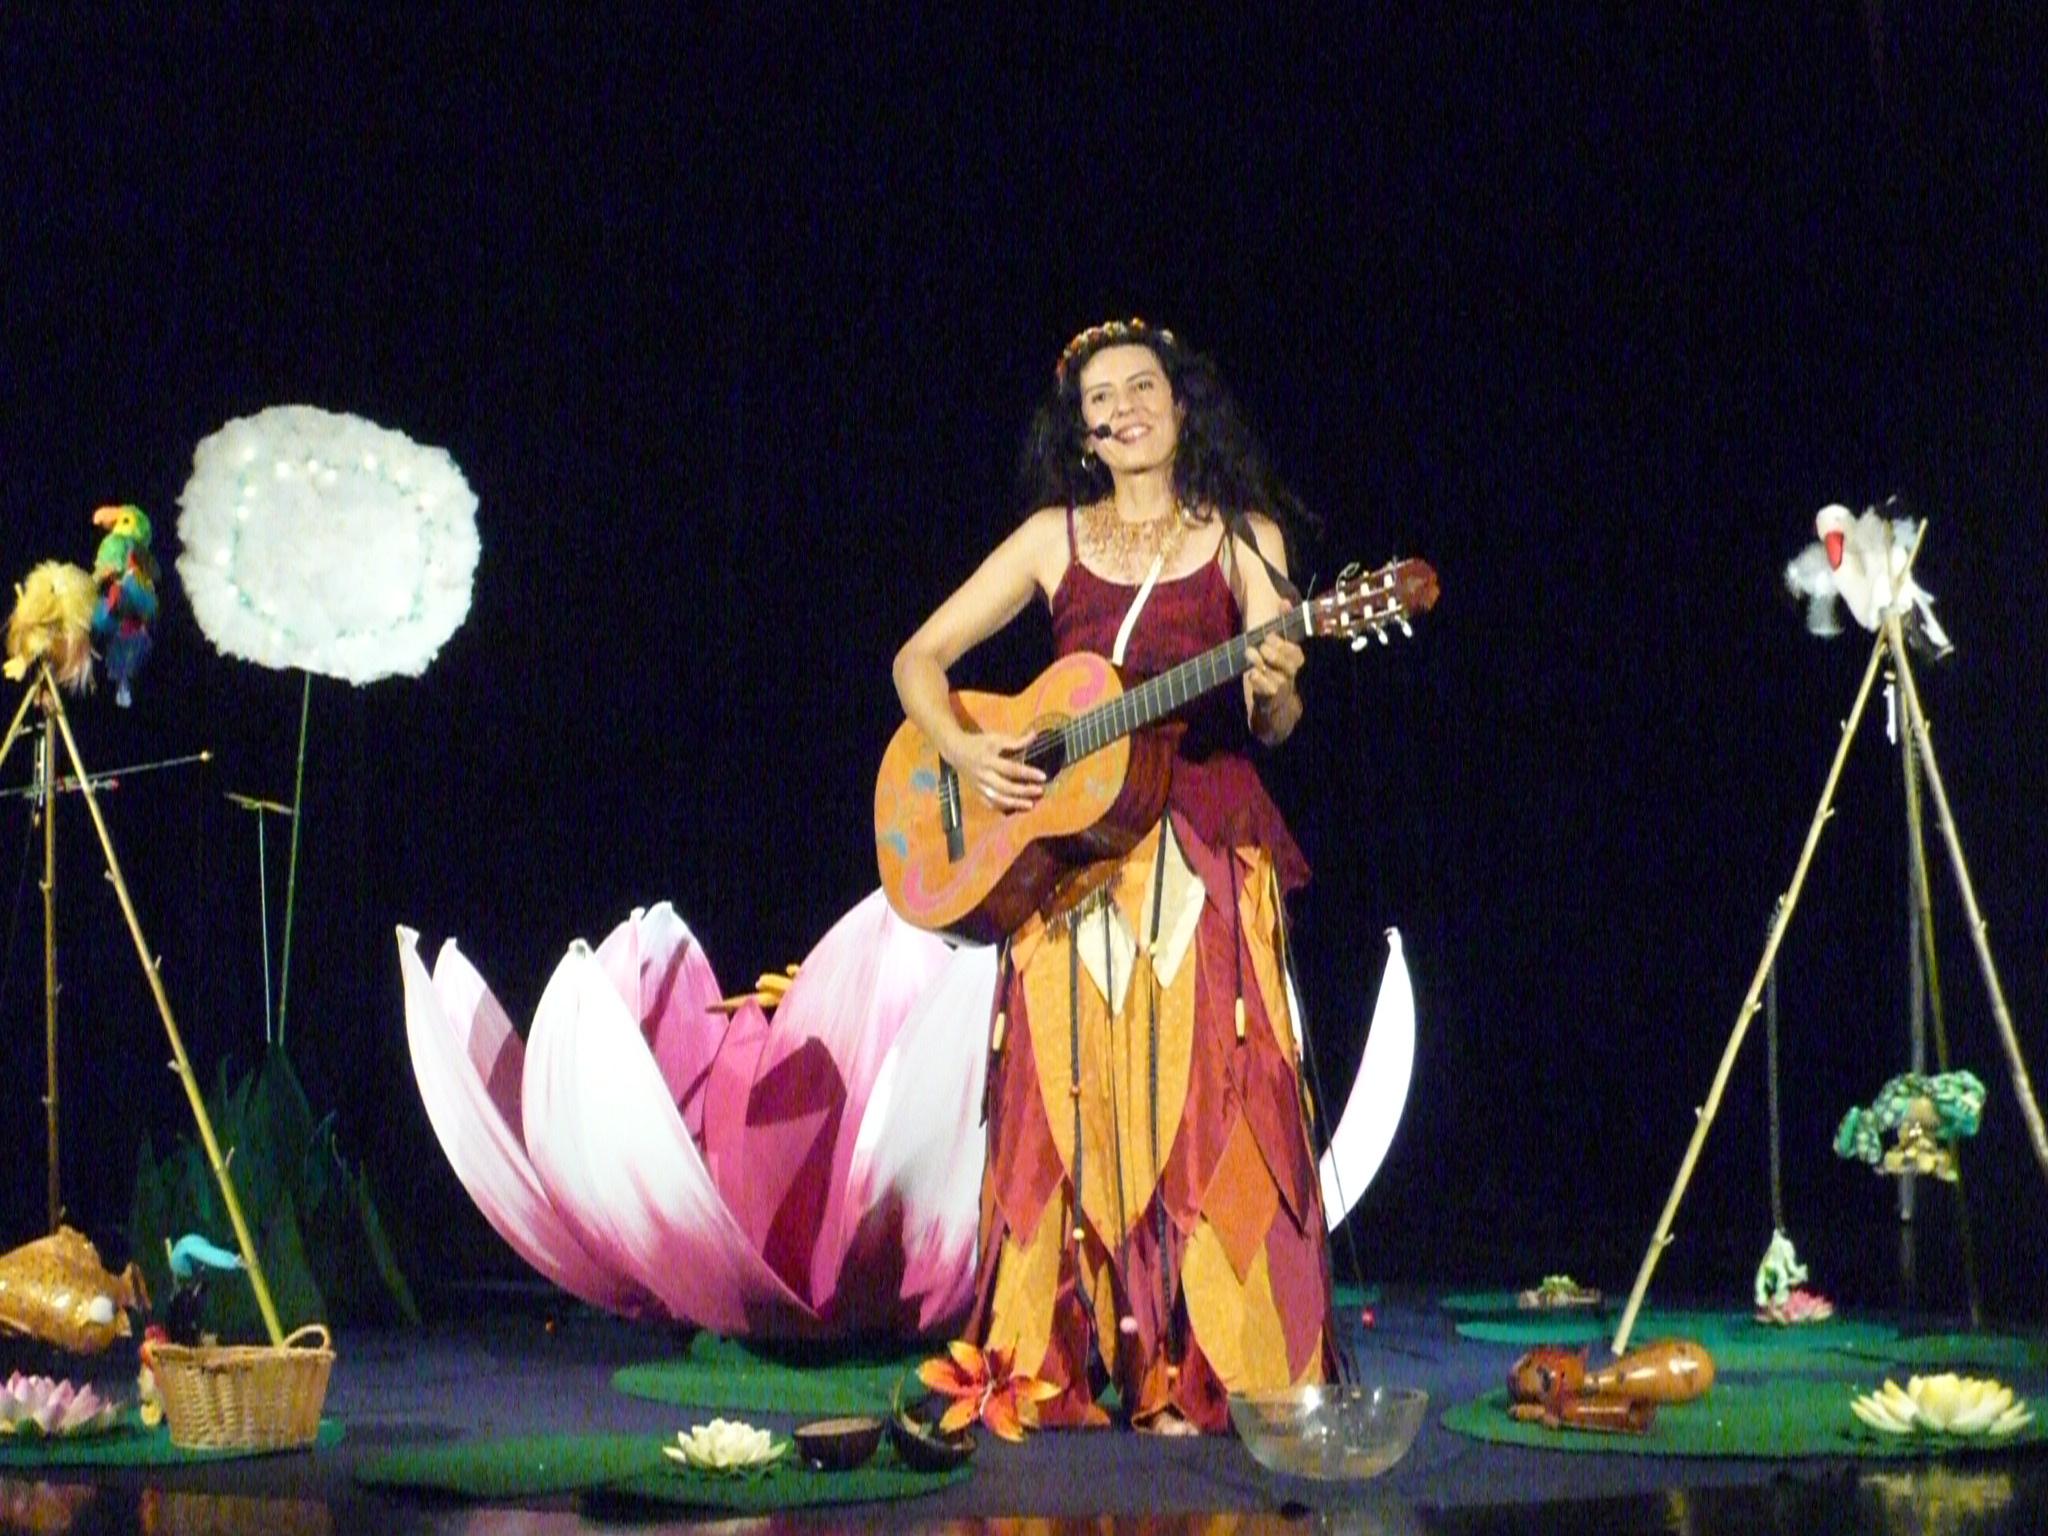 spectacle-musical_tout_petits_gotita15